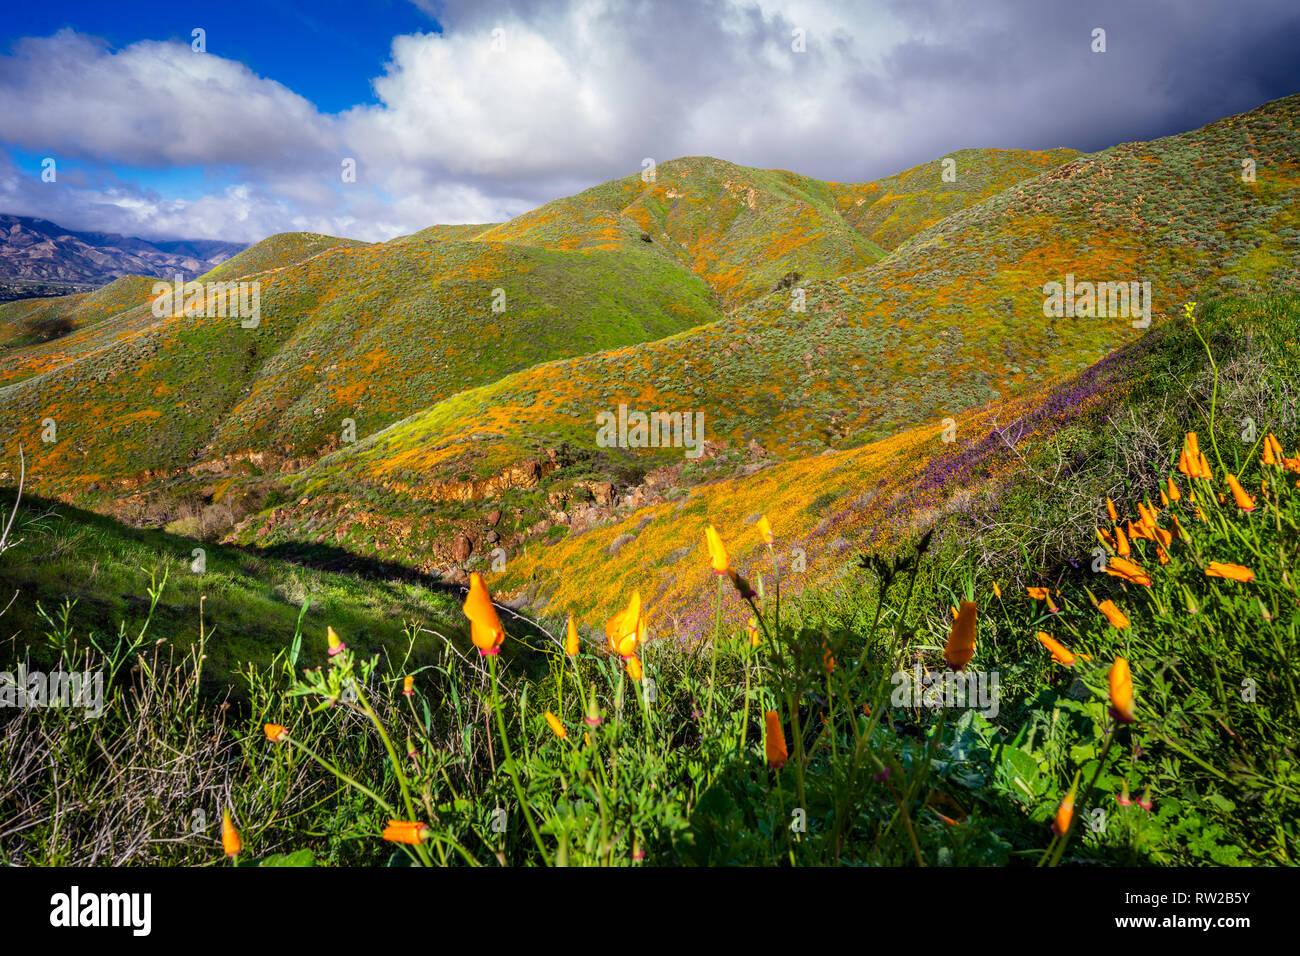 Wildflower Super Bloom - Stock Image